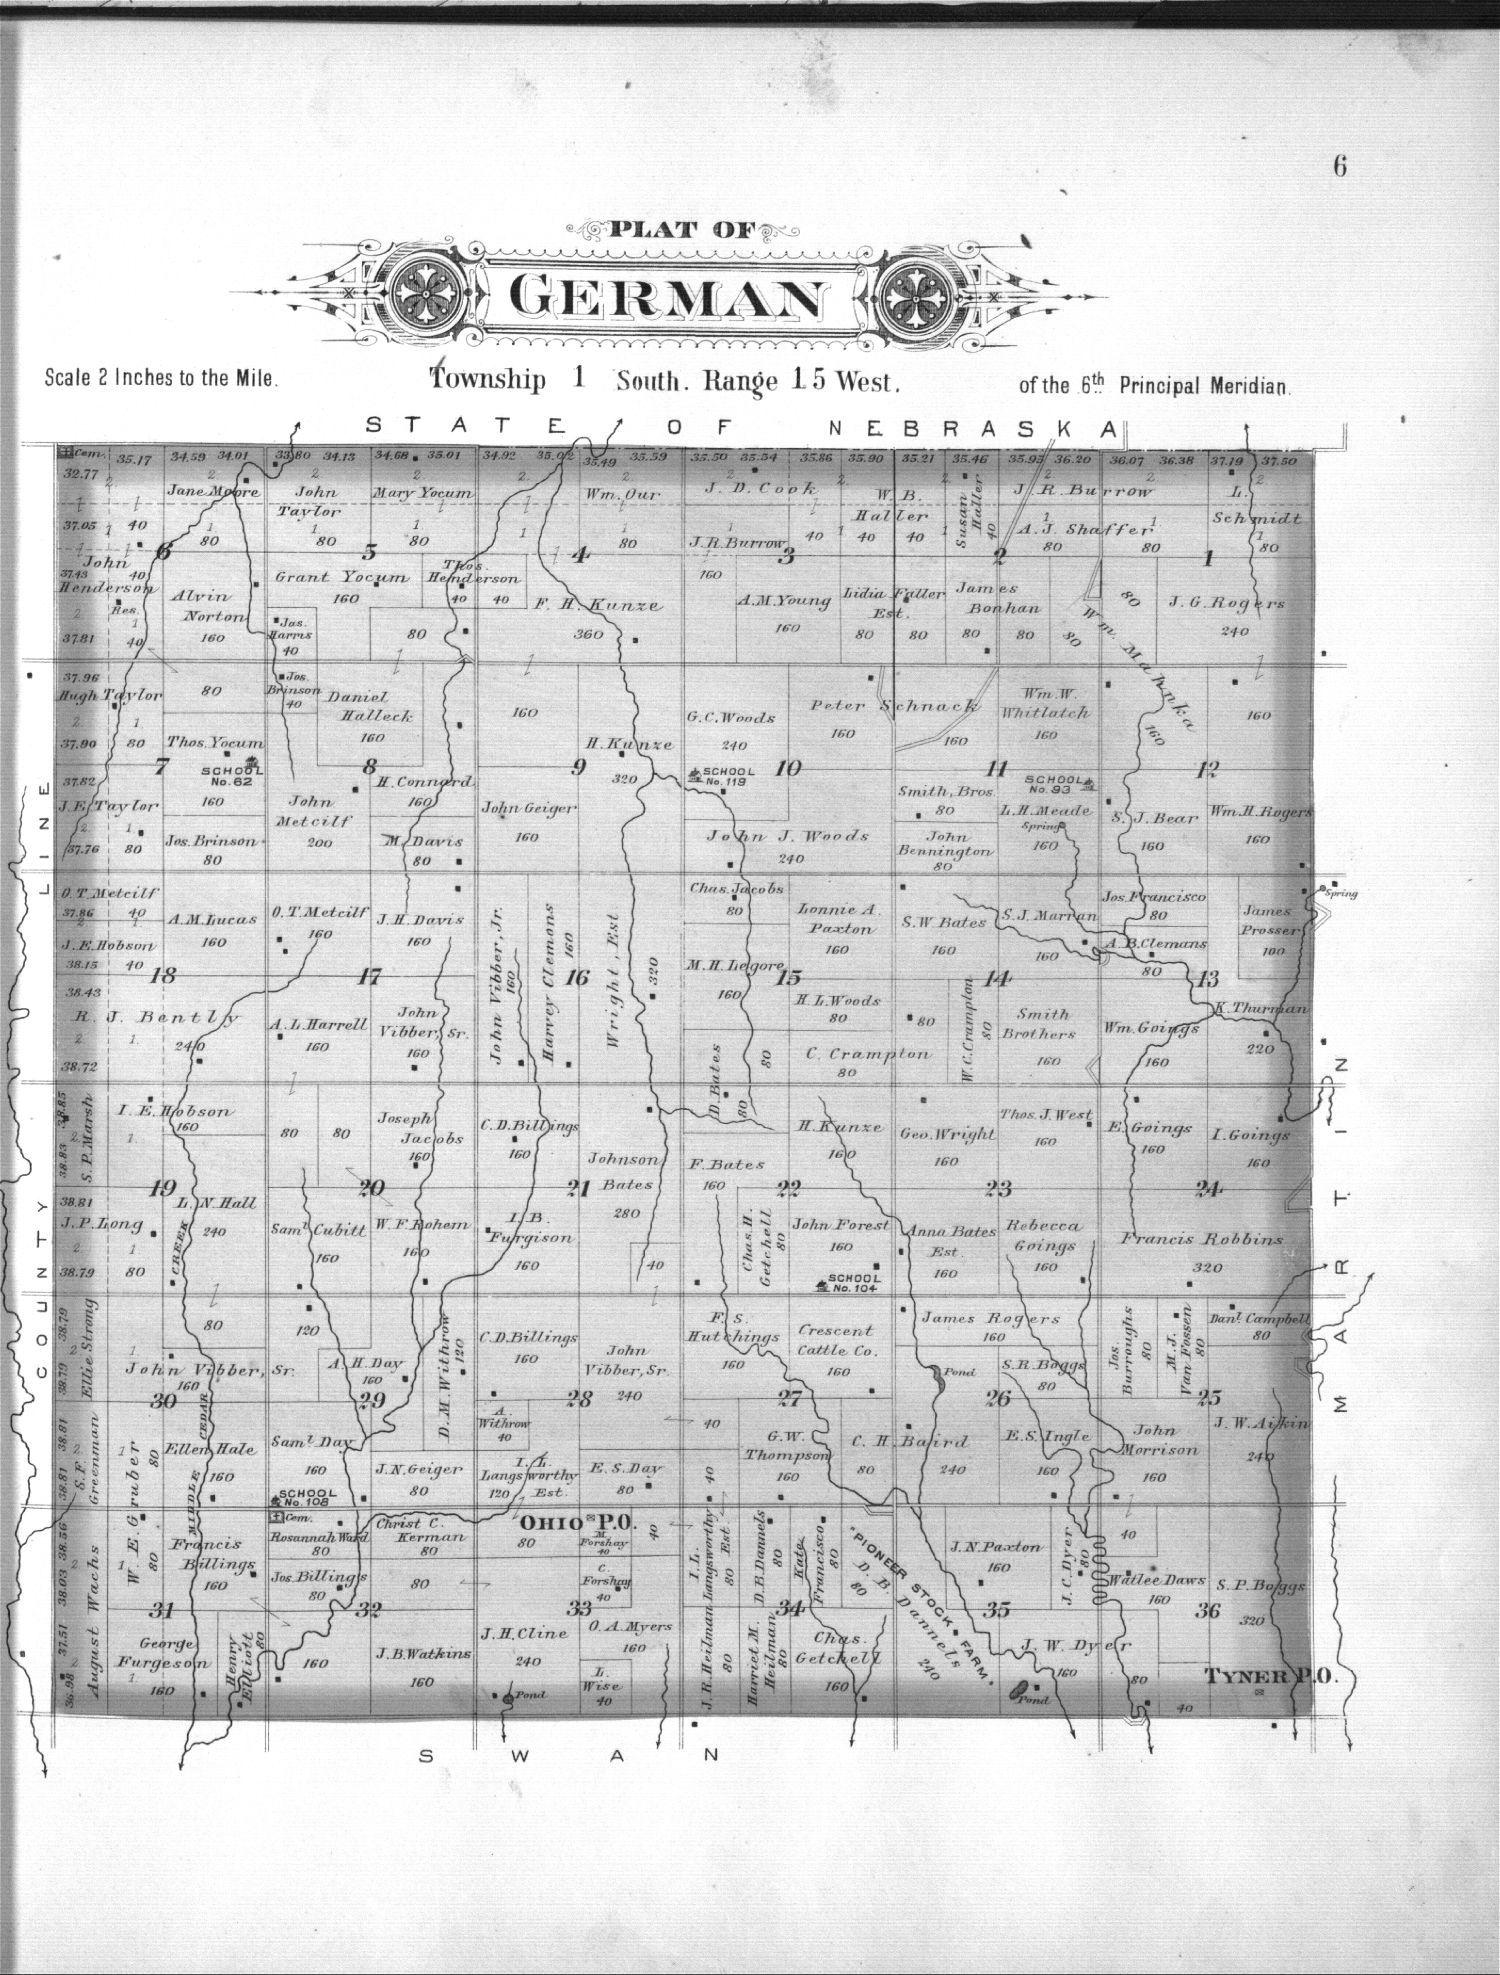 Plat book, Smith County, Kansas - 6